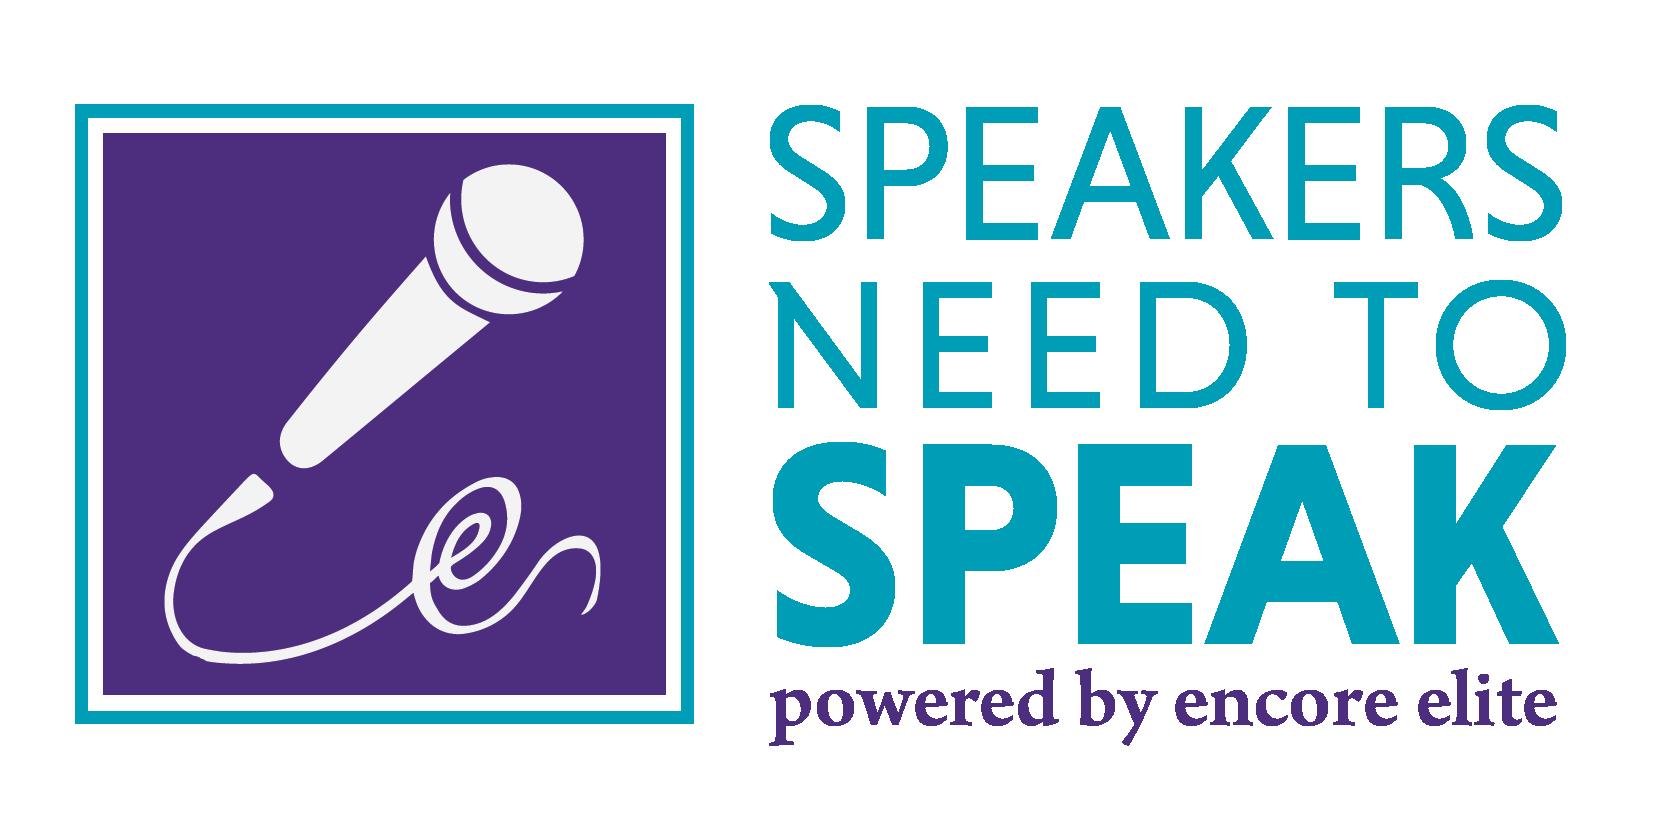 Speakers Need To Speak